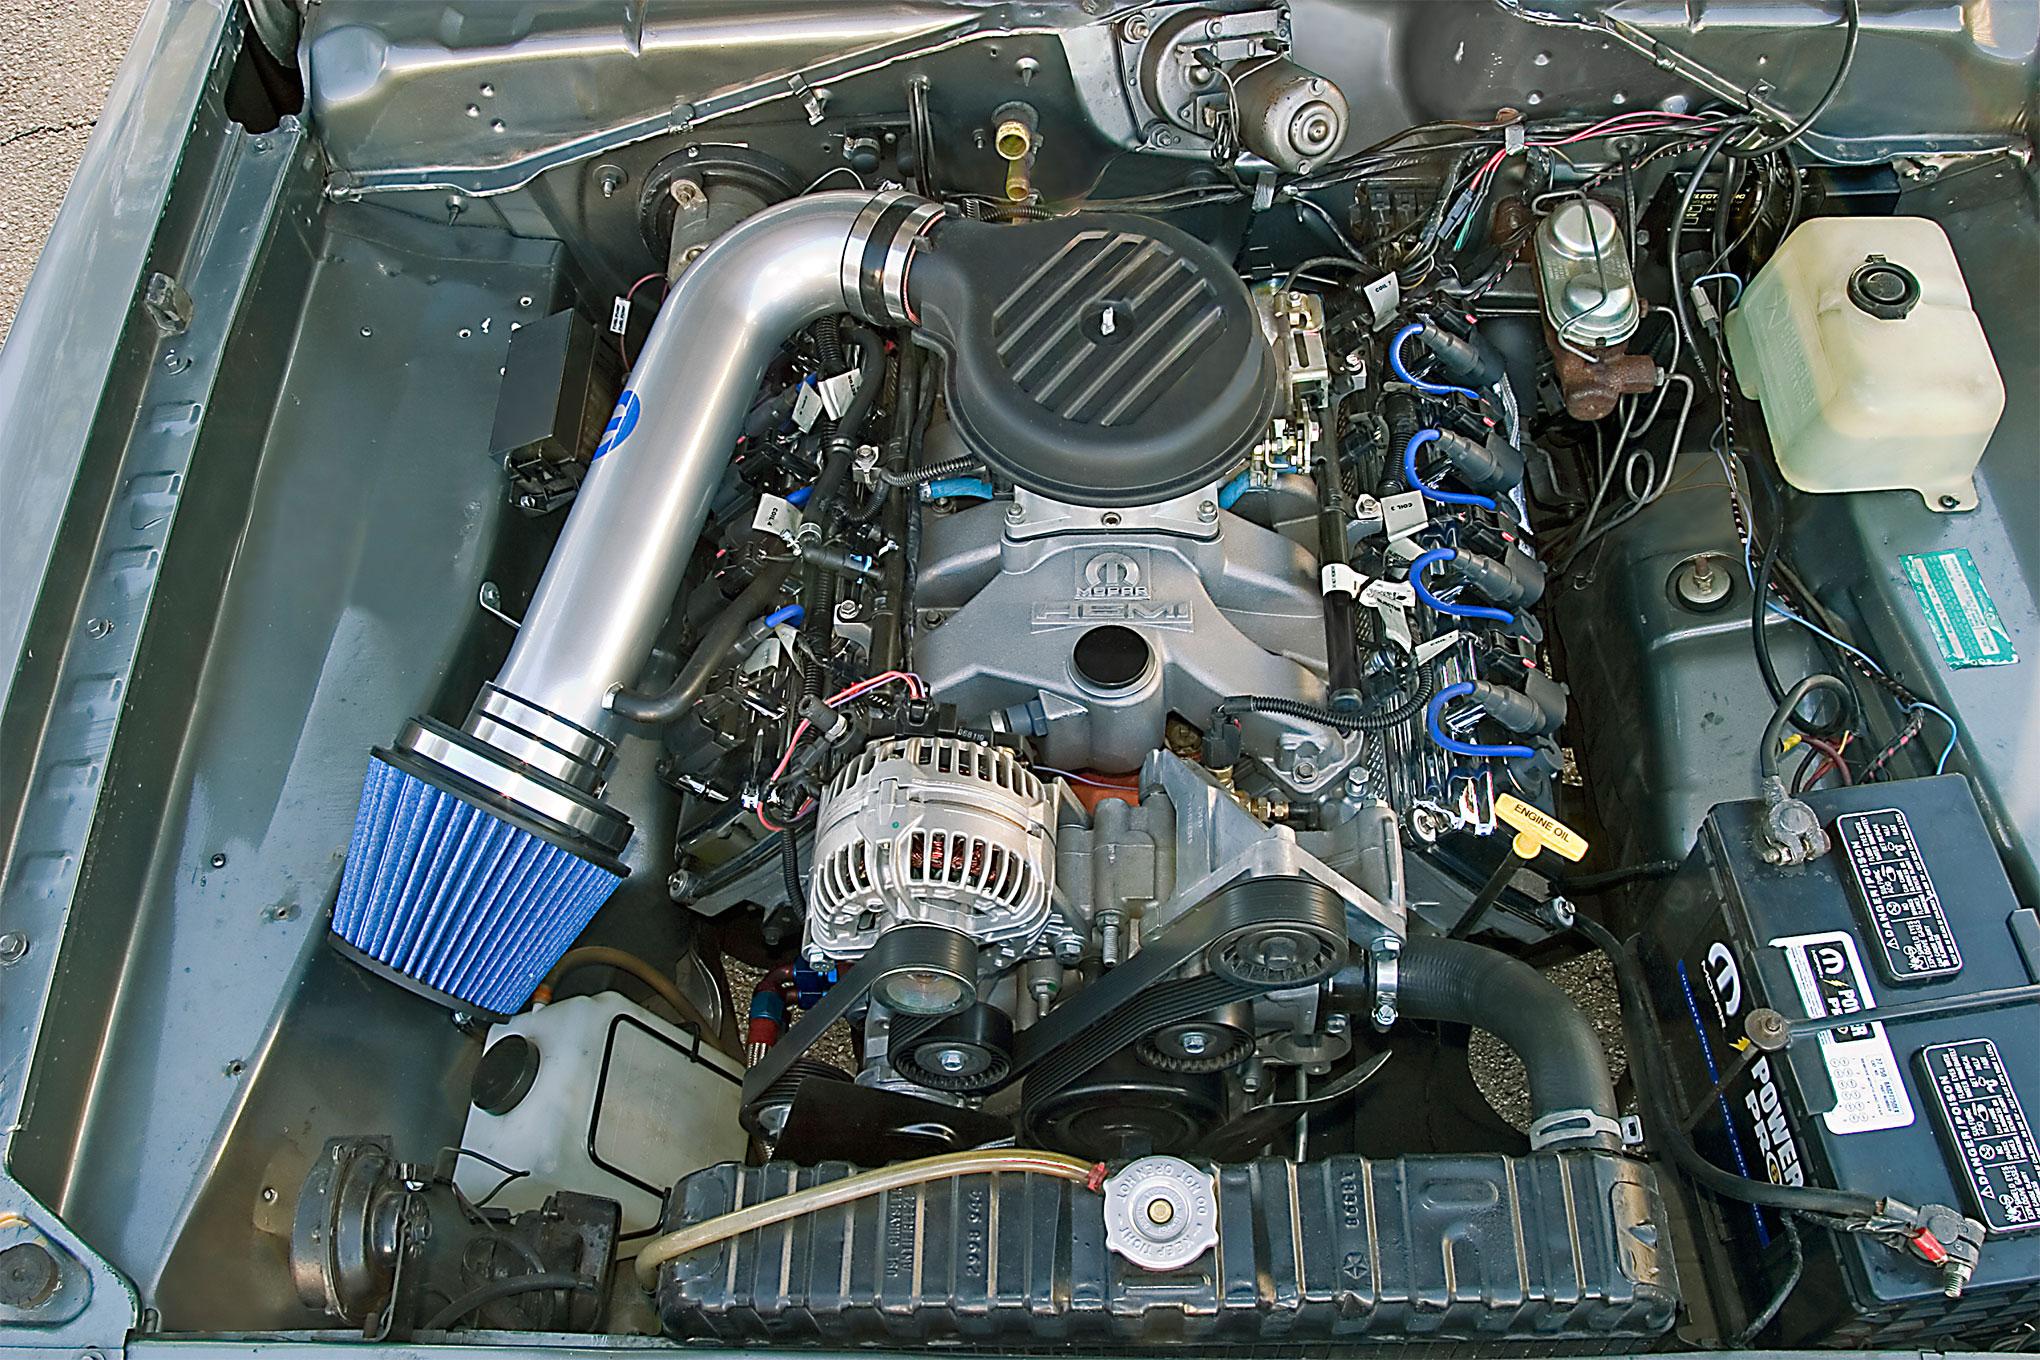 medium resolution of 426 hemi engine wiring diagram wiring diagram rh patrickpowell co dodge ram 1500 belt diagram dodge 5 7